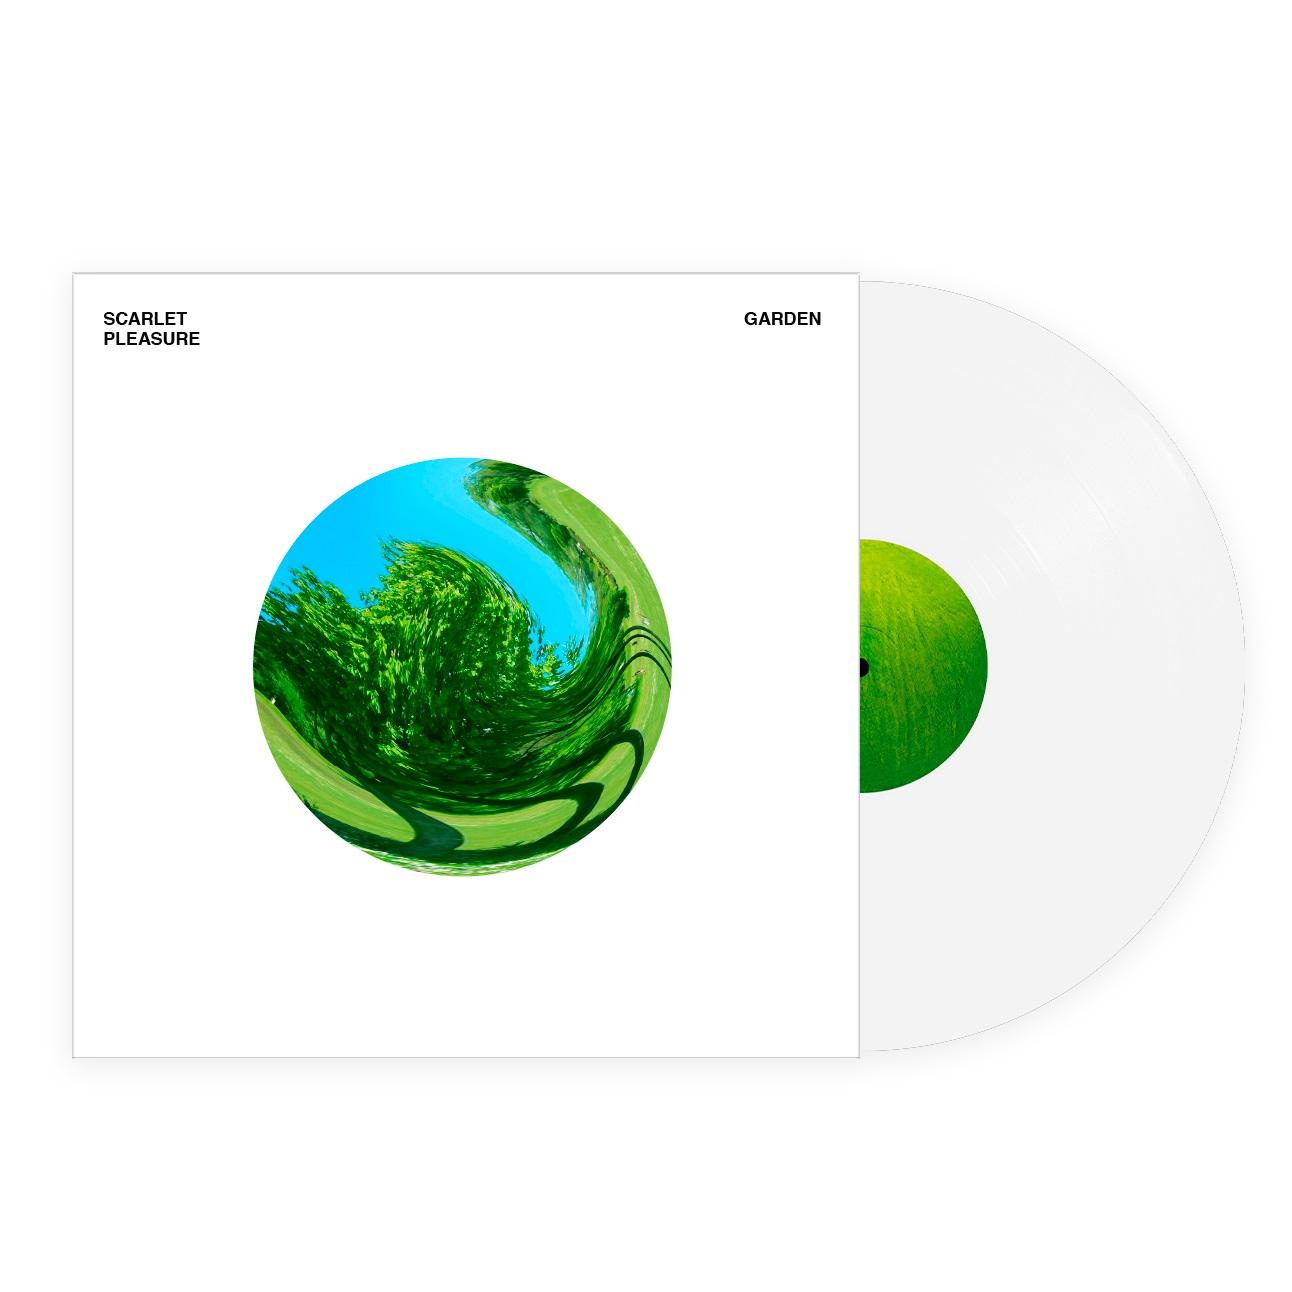 Garden - Hvid vinyl - Scarlet Pleasure - Musik -  - 0602507377663 - 2/10-2020